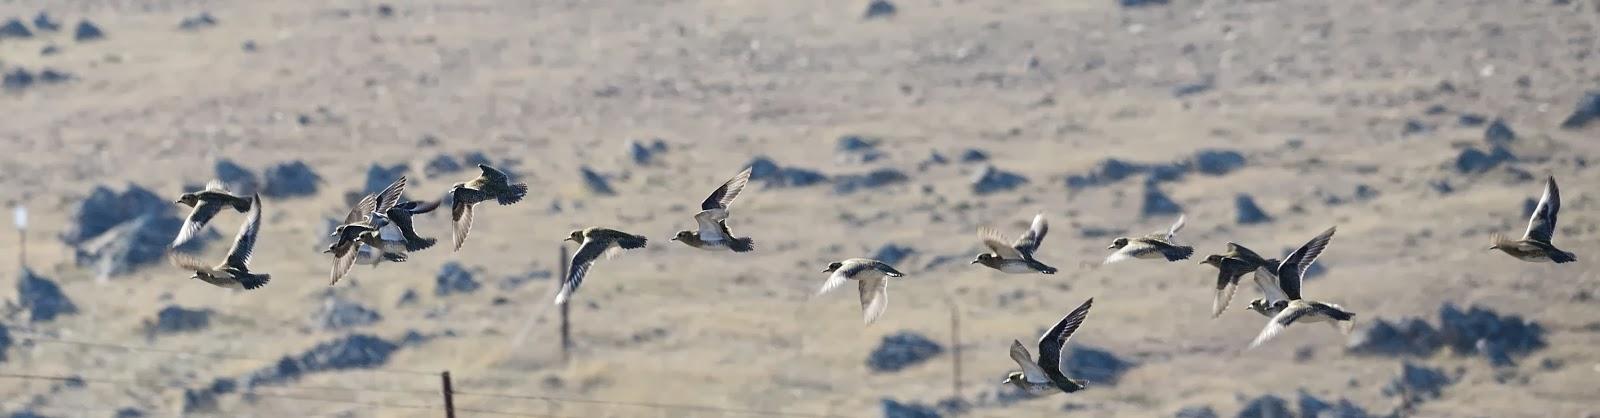 Excursión SEO/BirdLife a ZEPA del Alto Guadiato. Chorlito Dorado